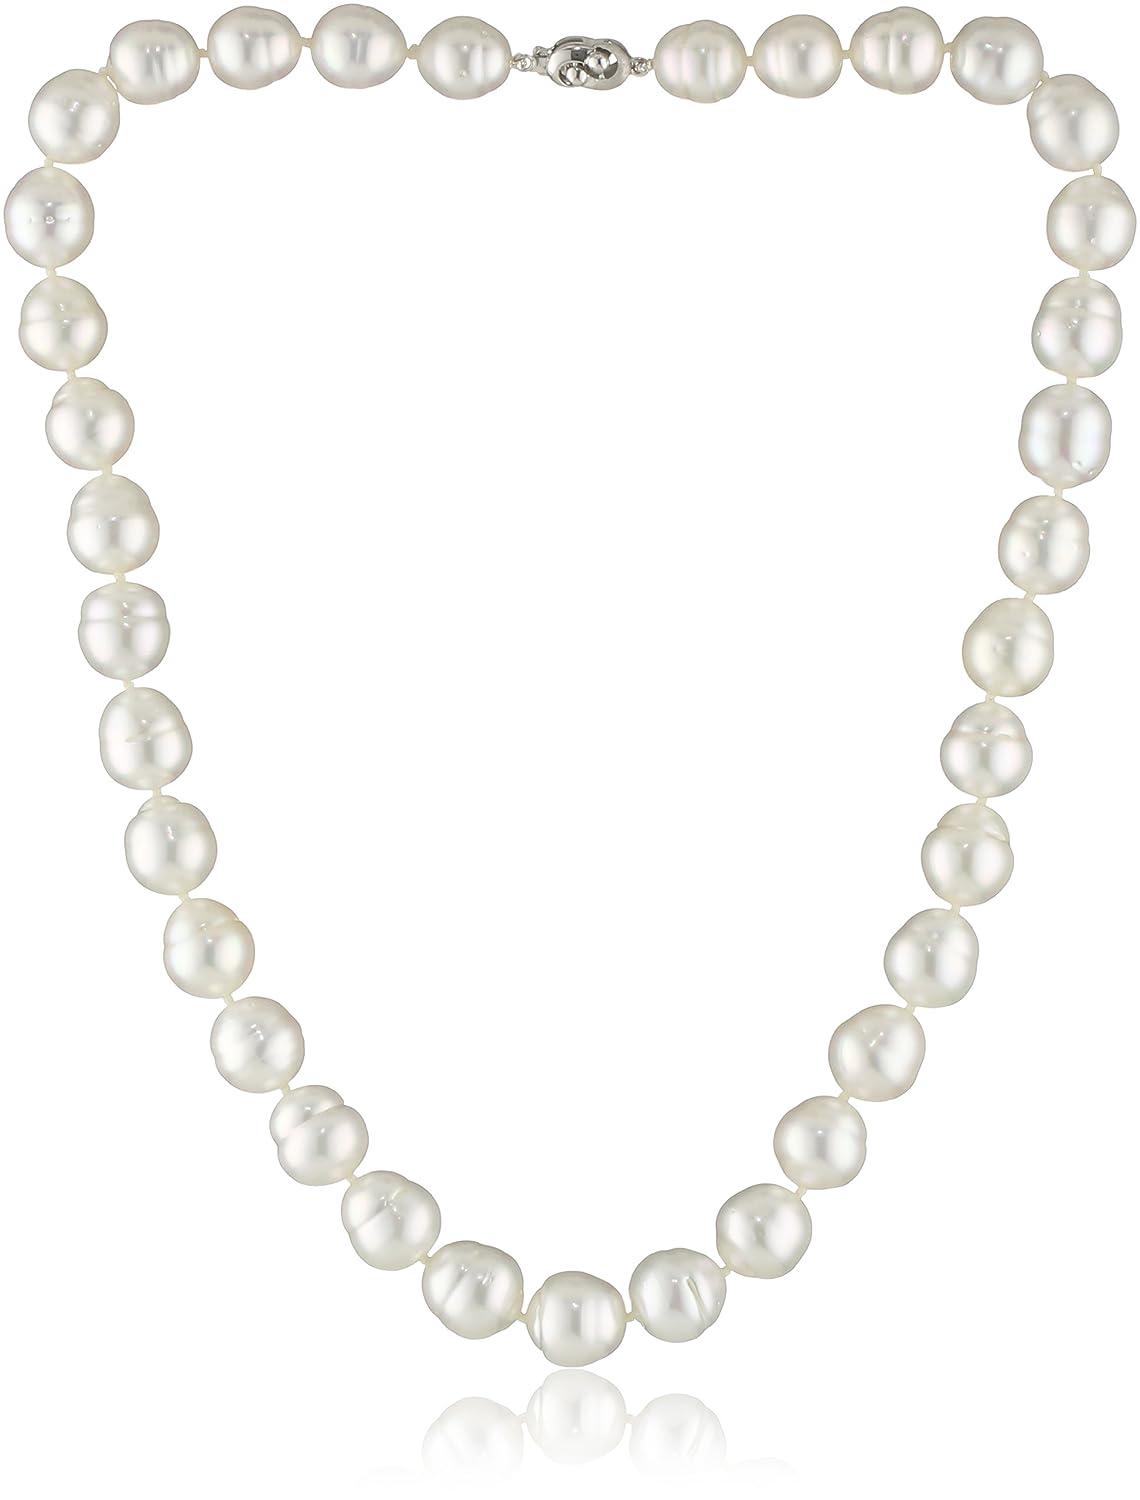 Amazon.com: Tara perlas natural-color Blanco South Sea Perla ...